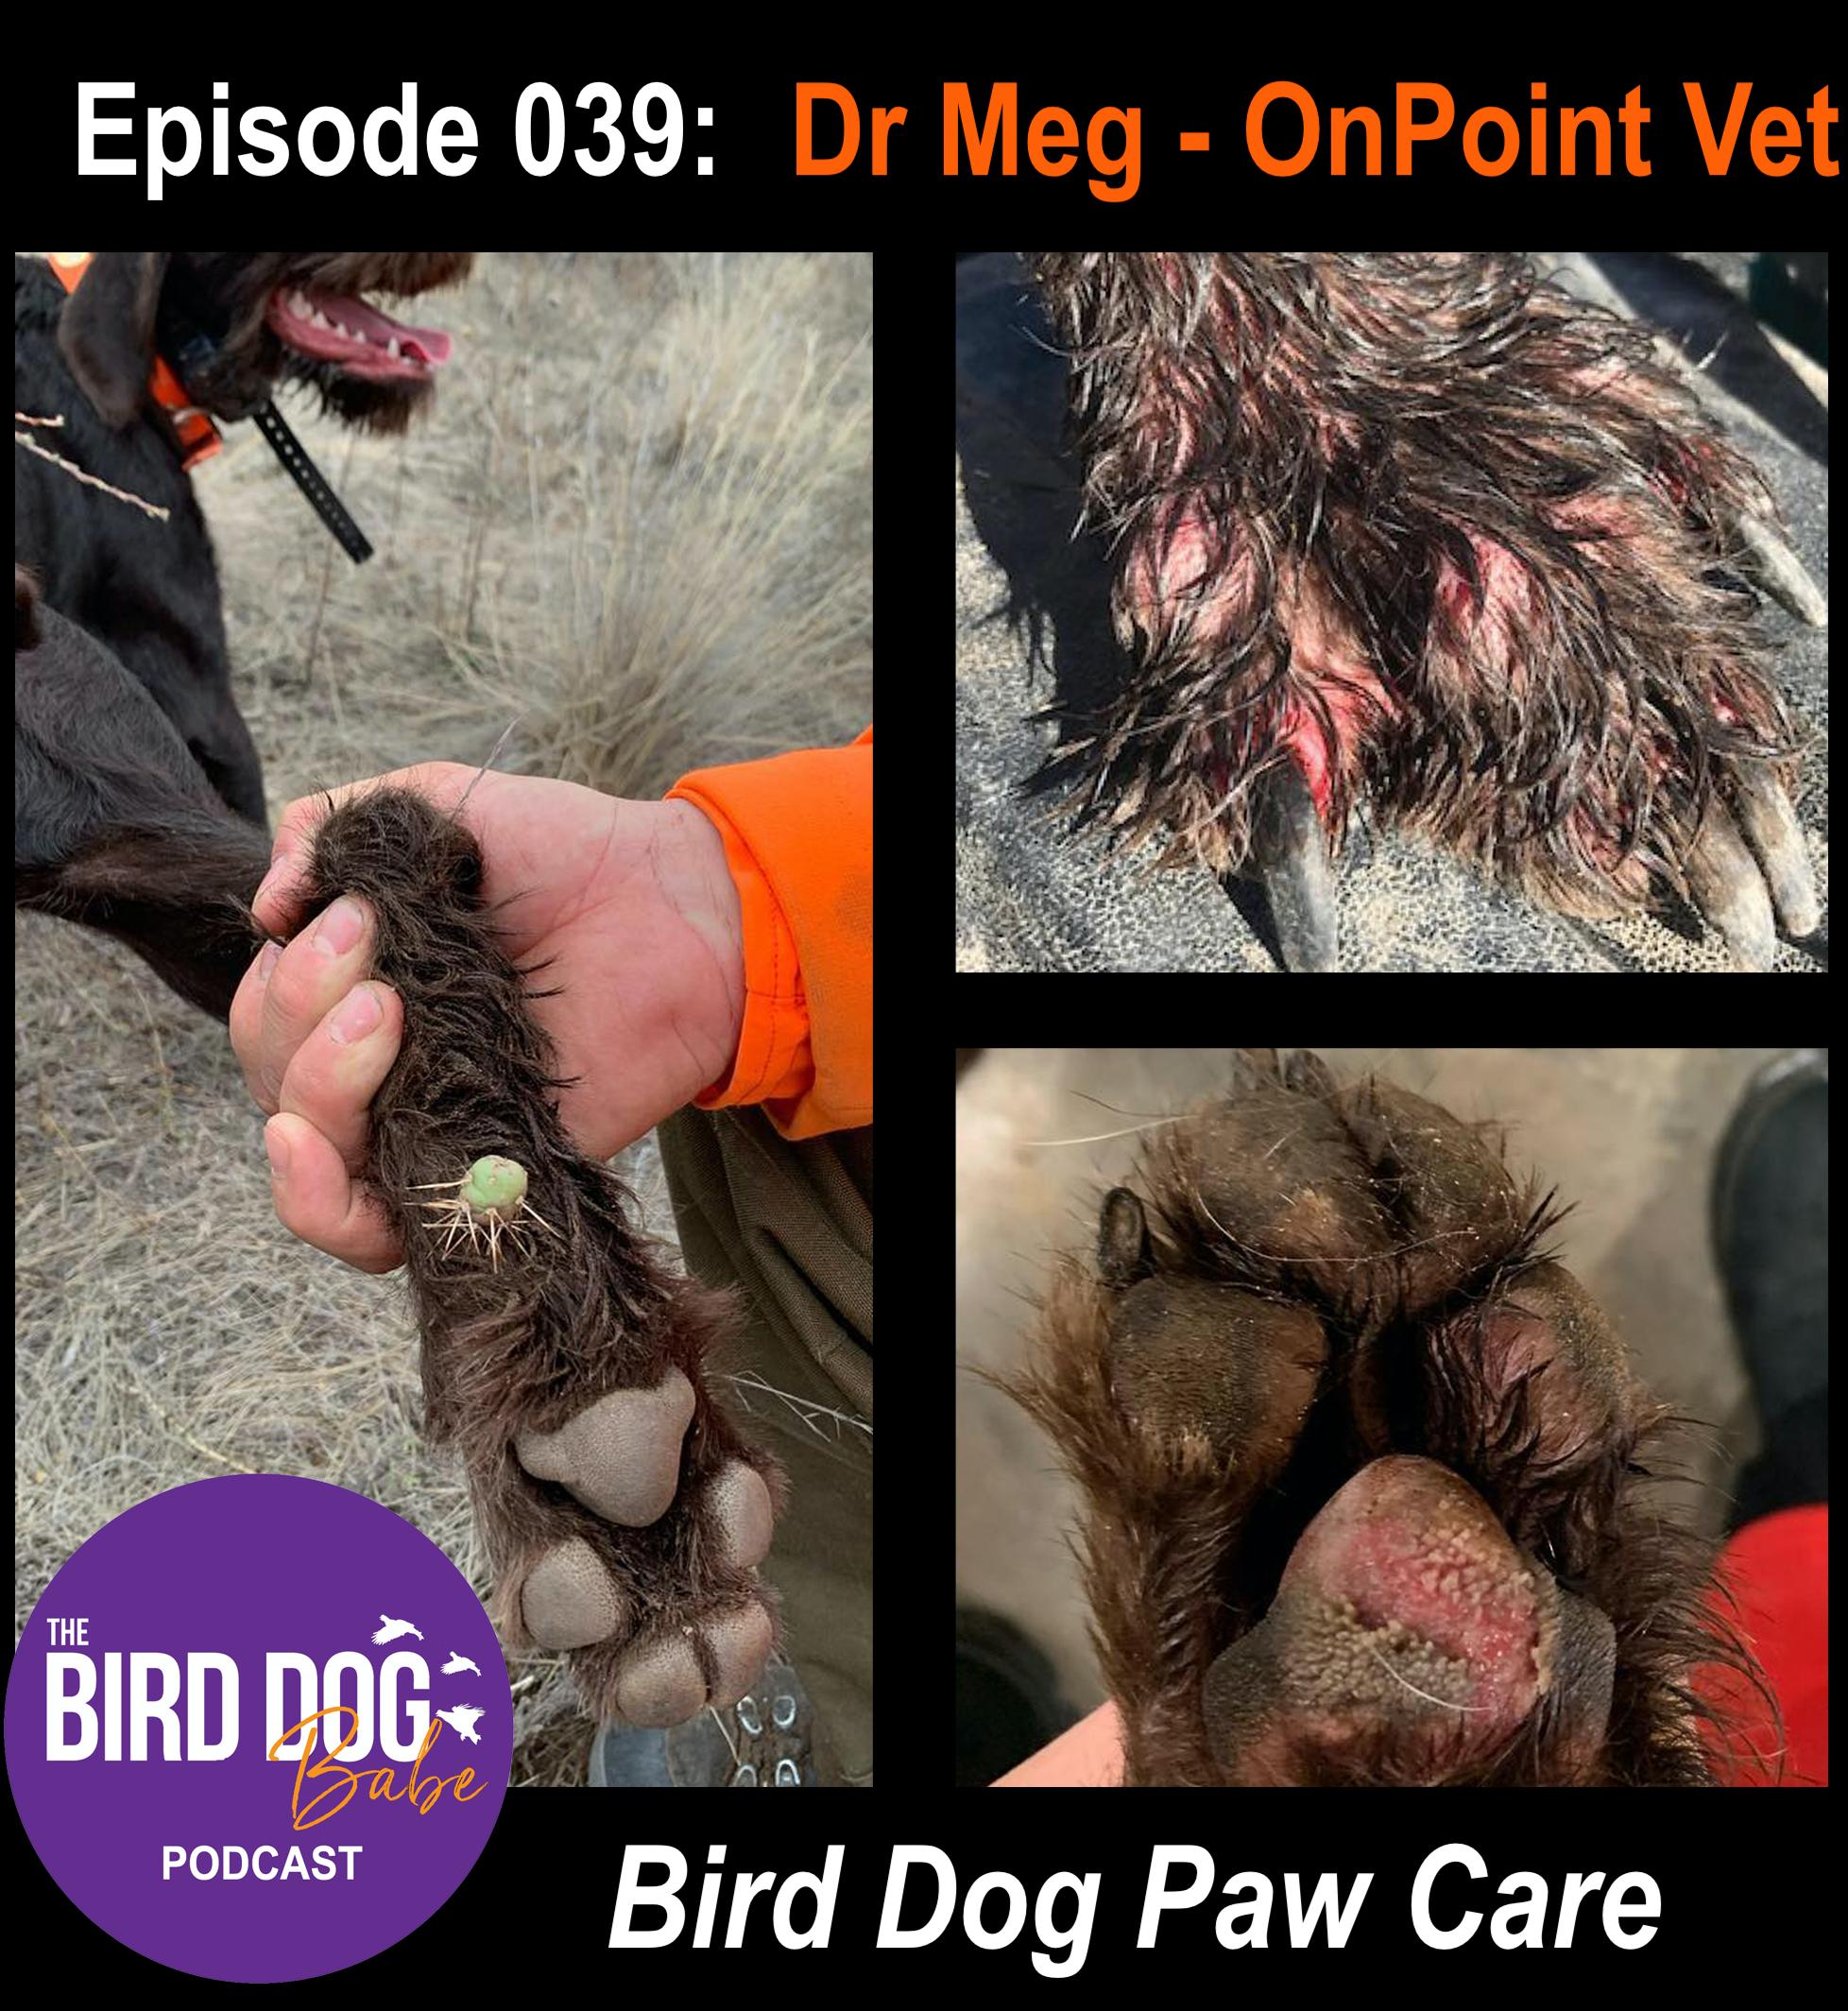 Episode 039: Bird Dog Paw Care w/ Dr Meg